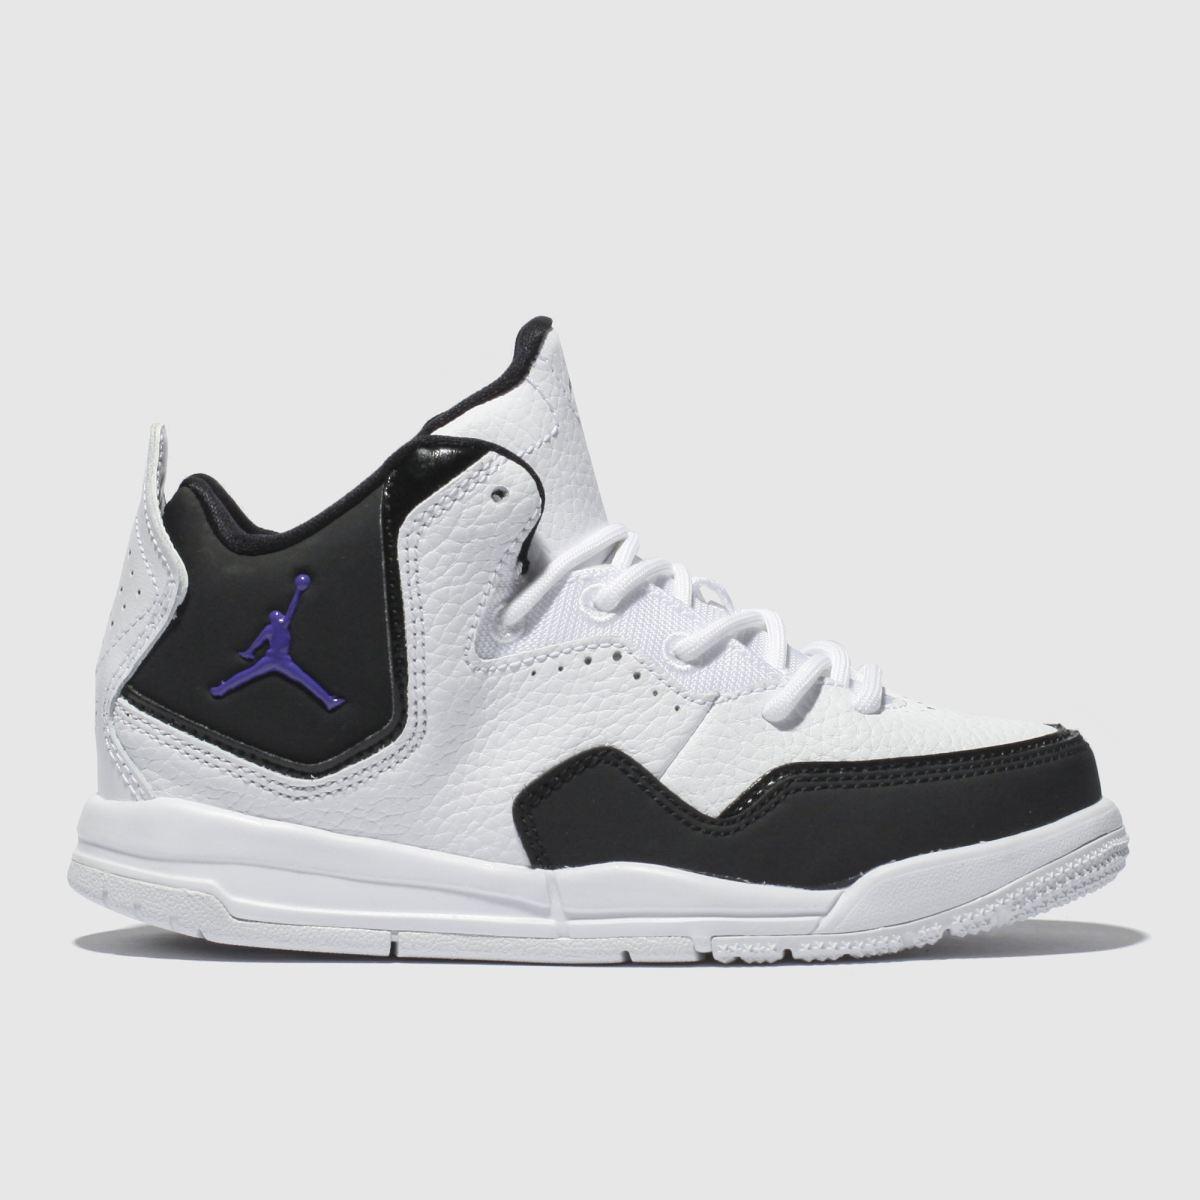 Nike Jordan White & Black Courtside 23 Trainers Junior